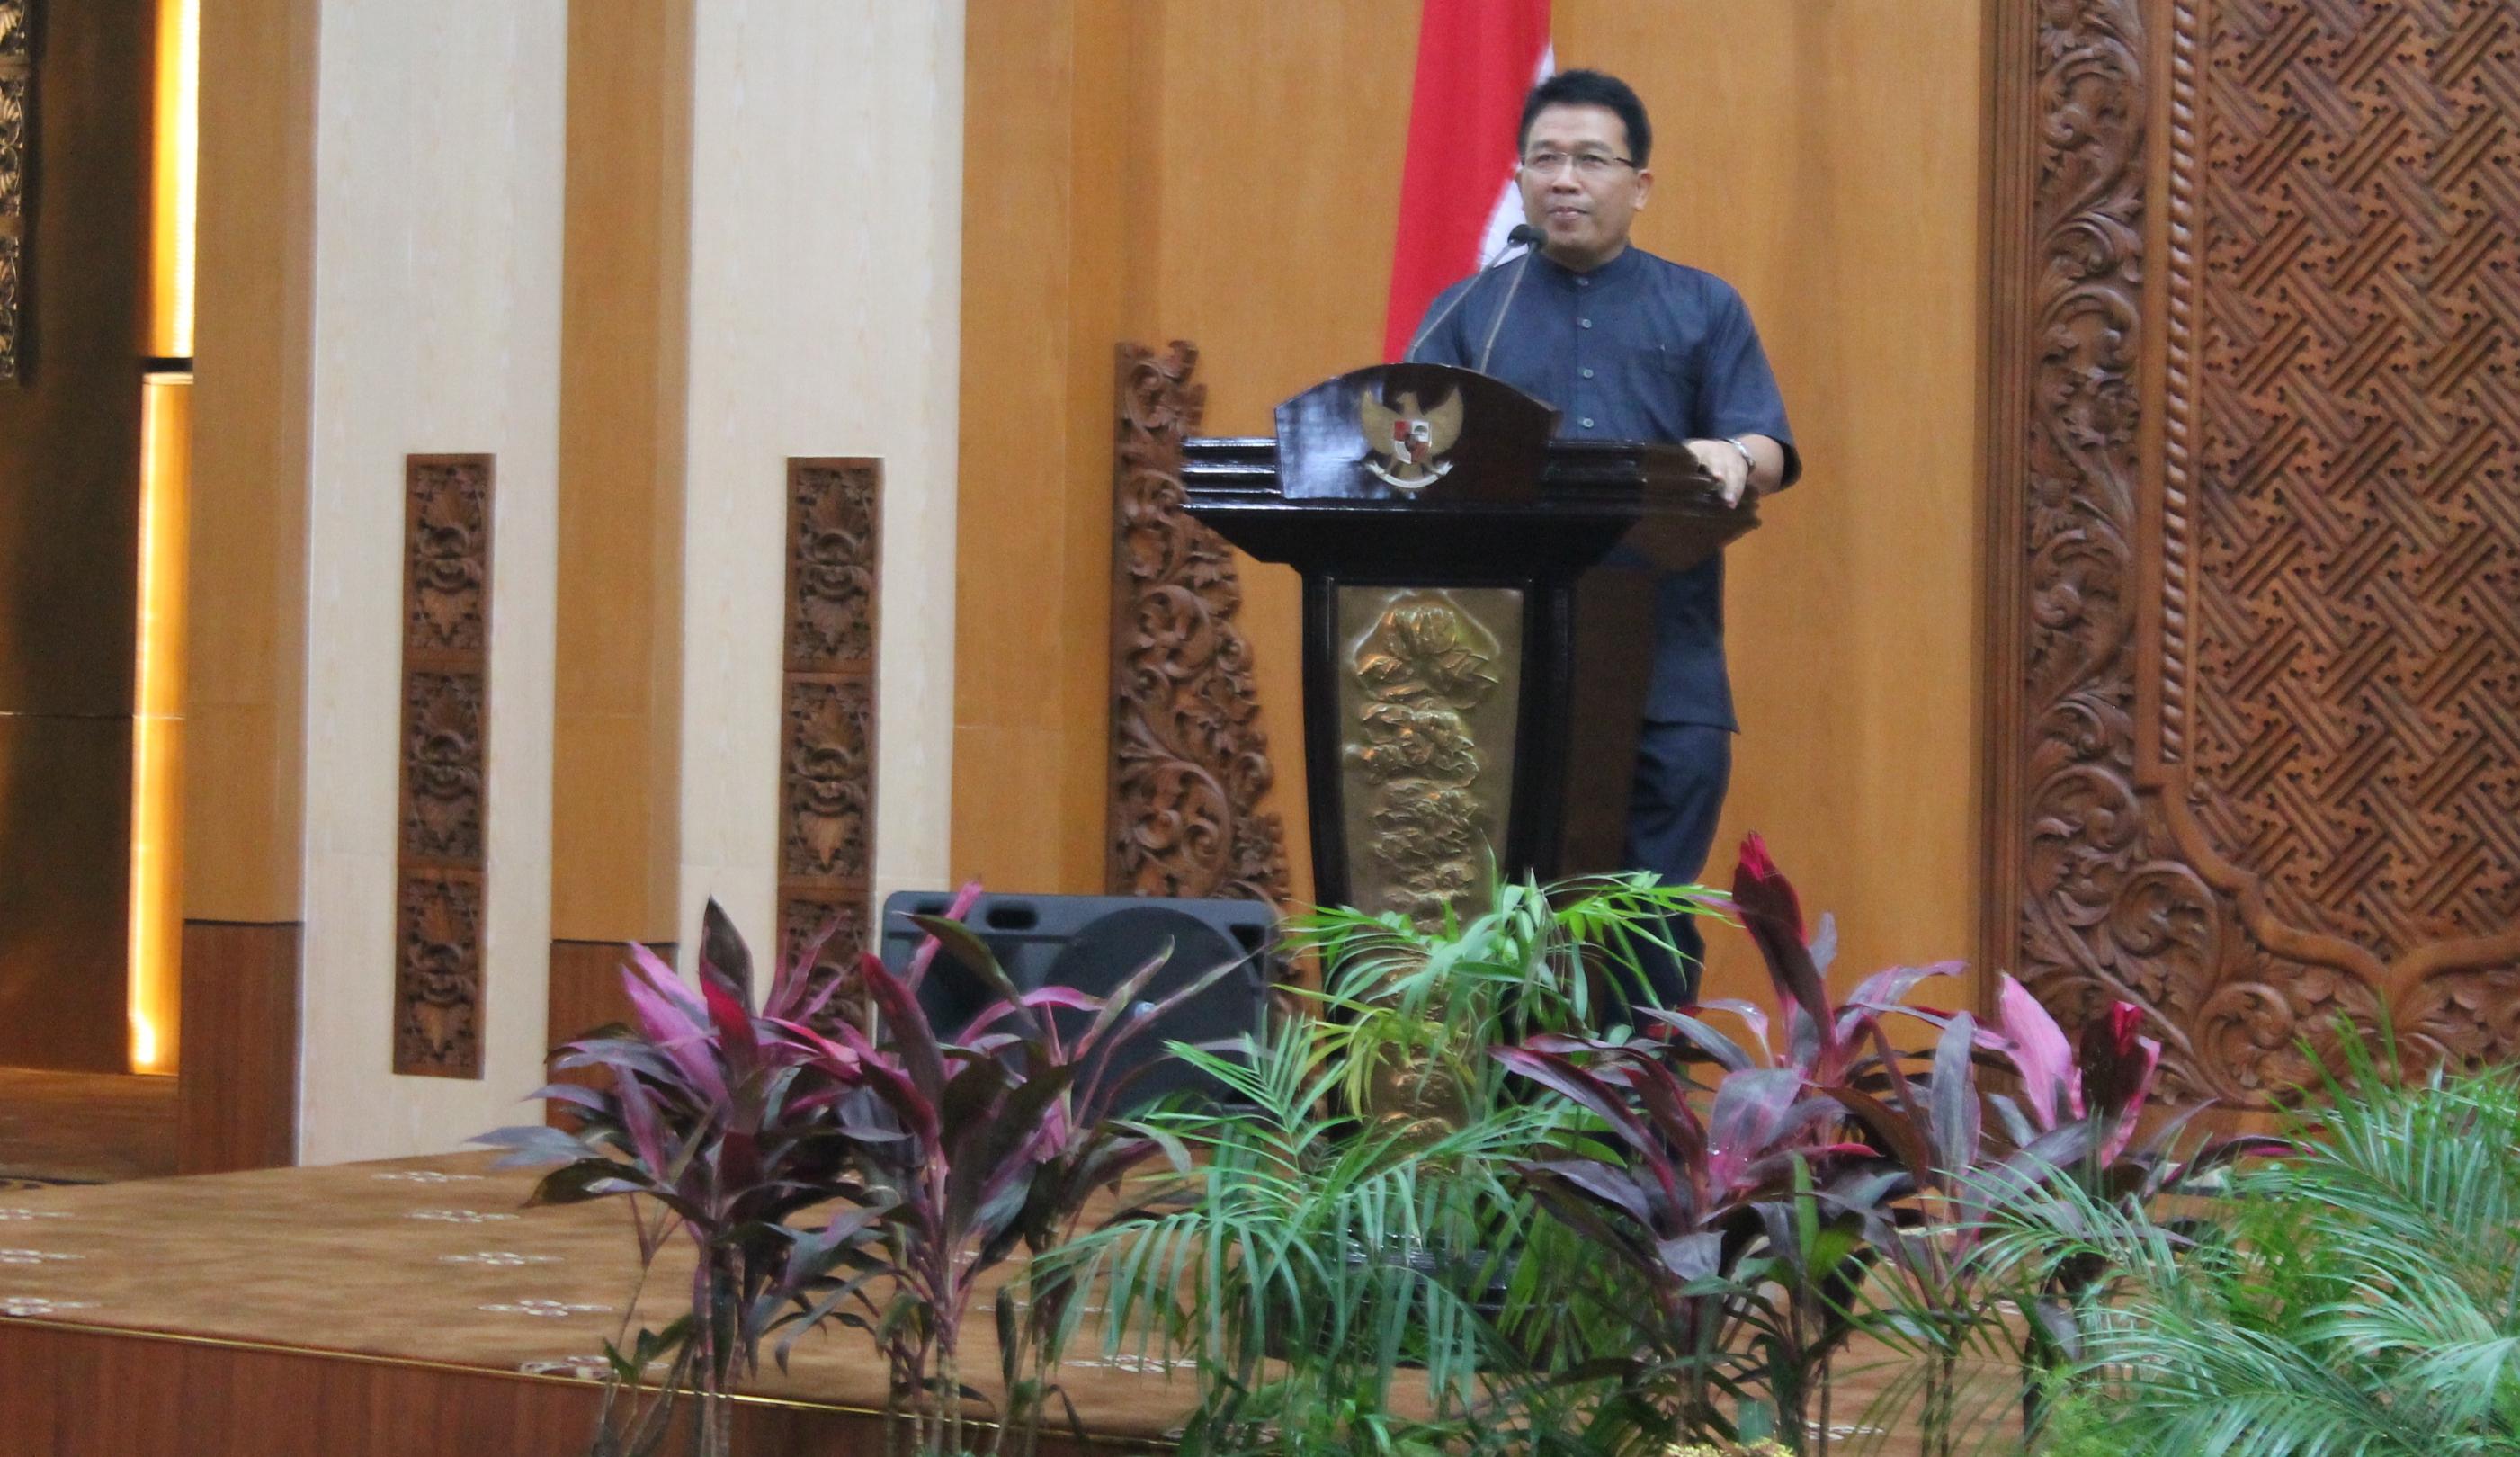 Paparan Bupati<BR>Evaluasi Implementasi SAKIP di Kabupaten Bojonegoro